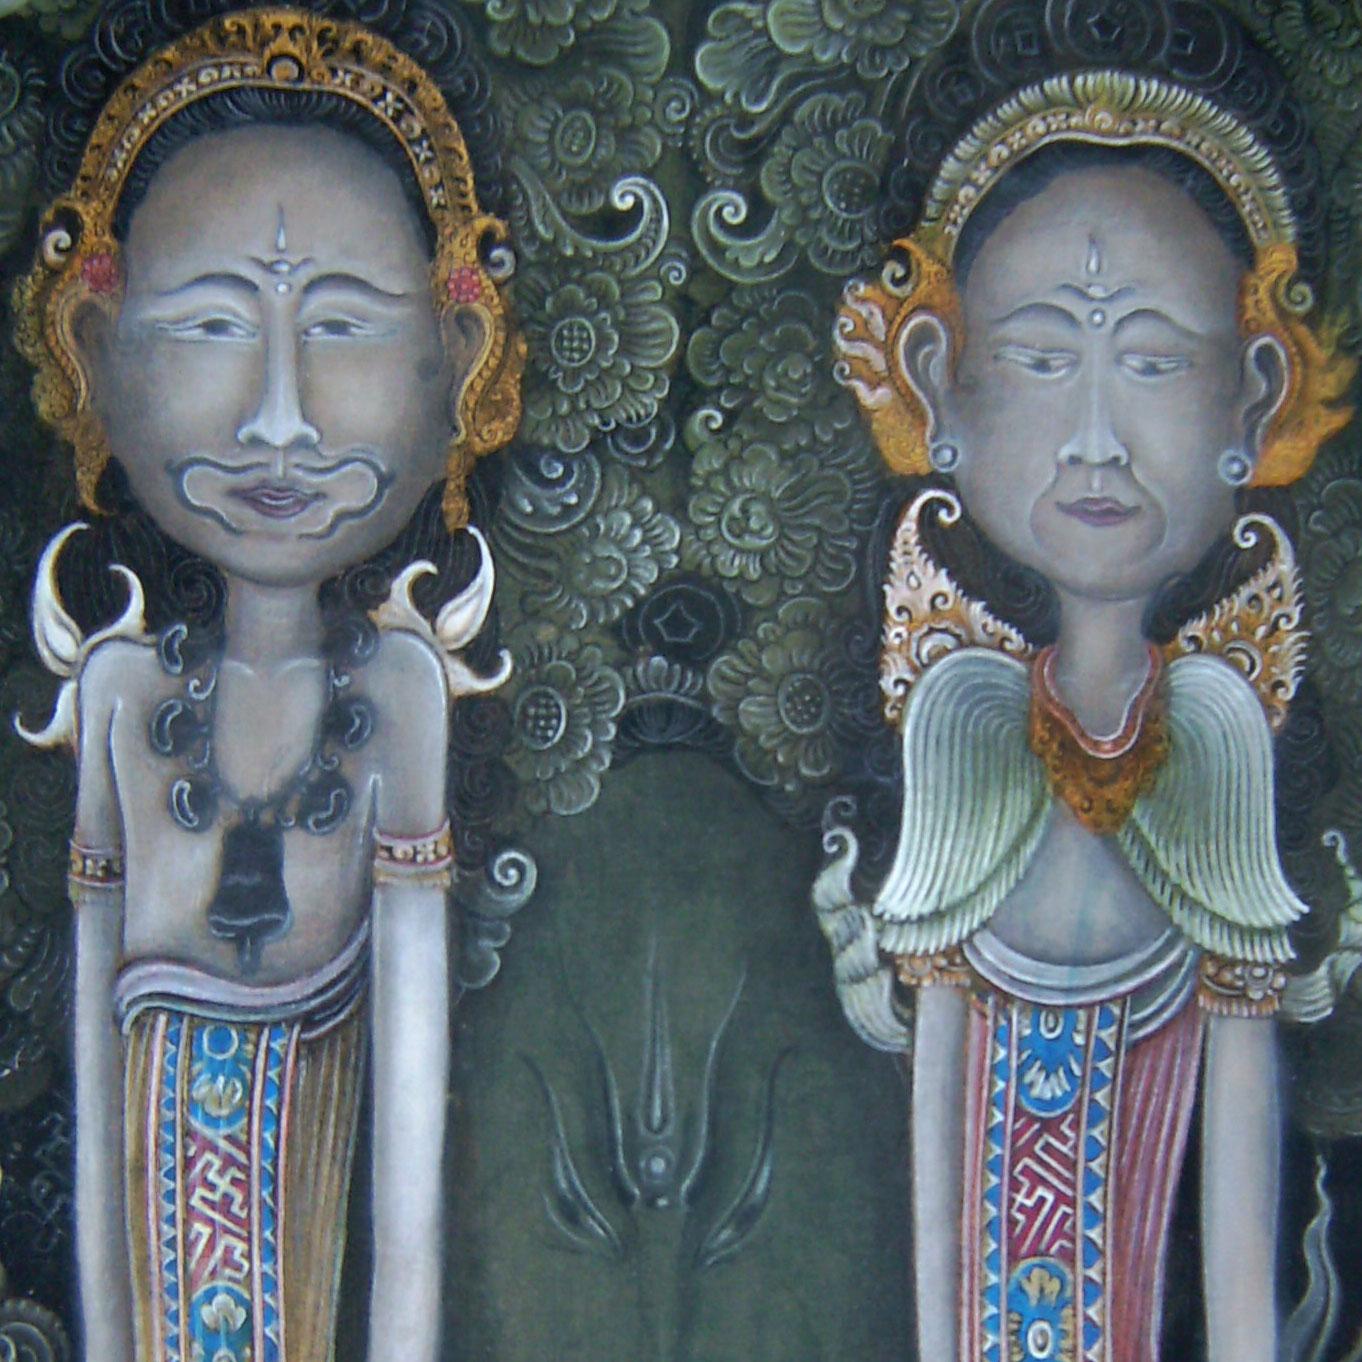 Bali Künstler I-Gusti-Wedagama